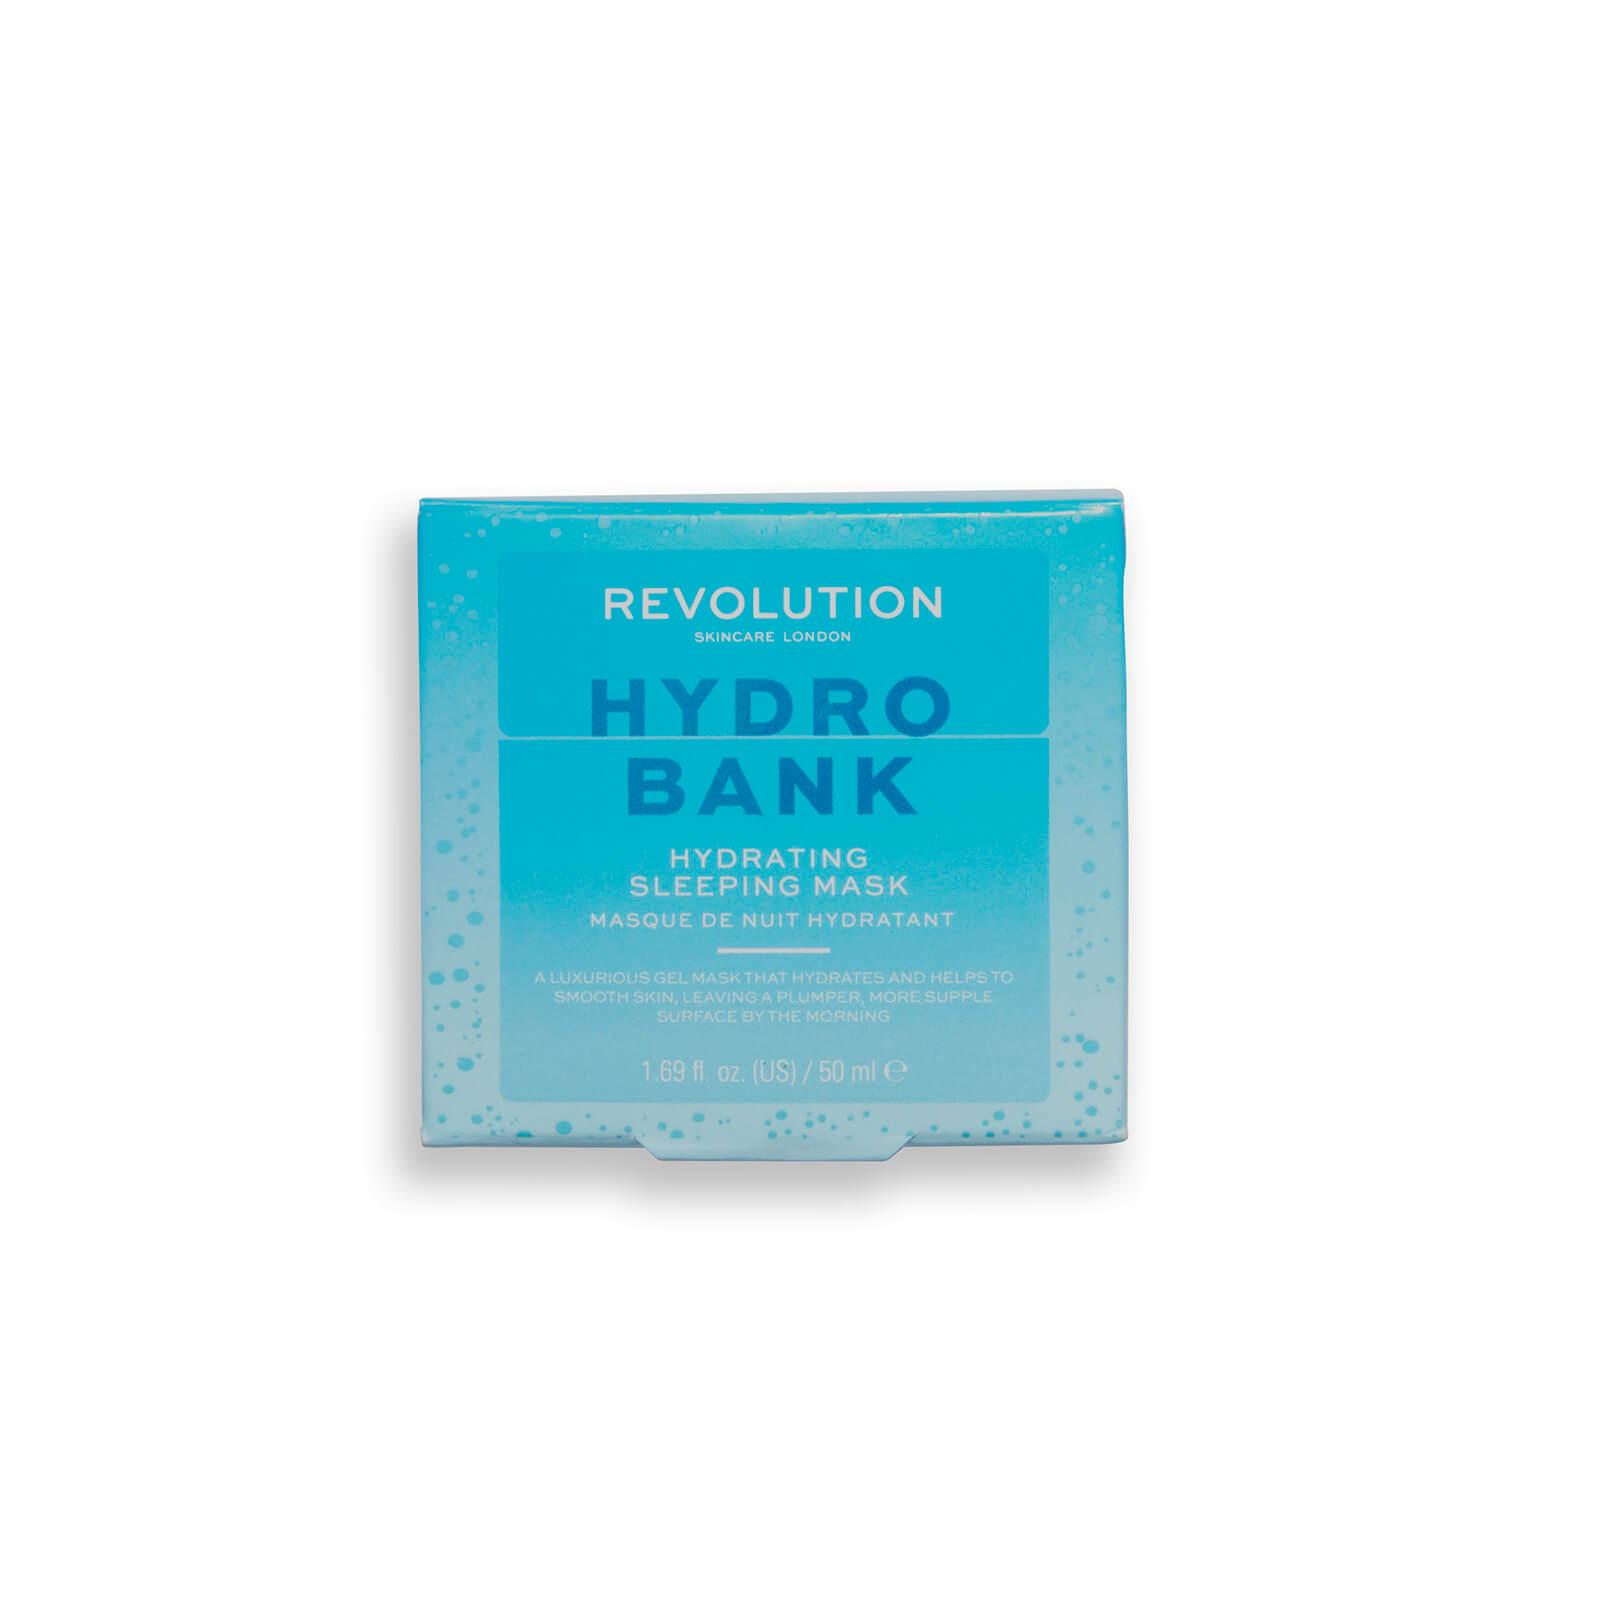 Купить Revolution Skincare Hydro Bank Hydro Bank Hydrating Sleeping Mask Увлажняющая ночная маска